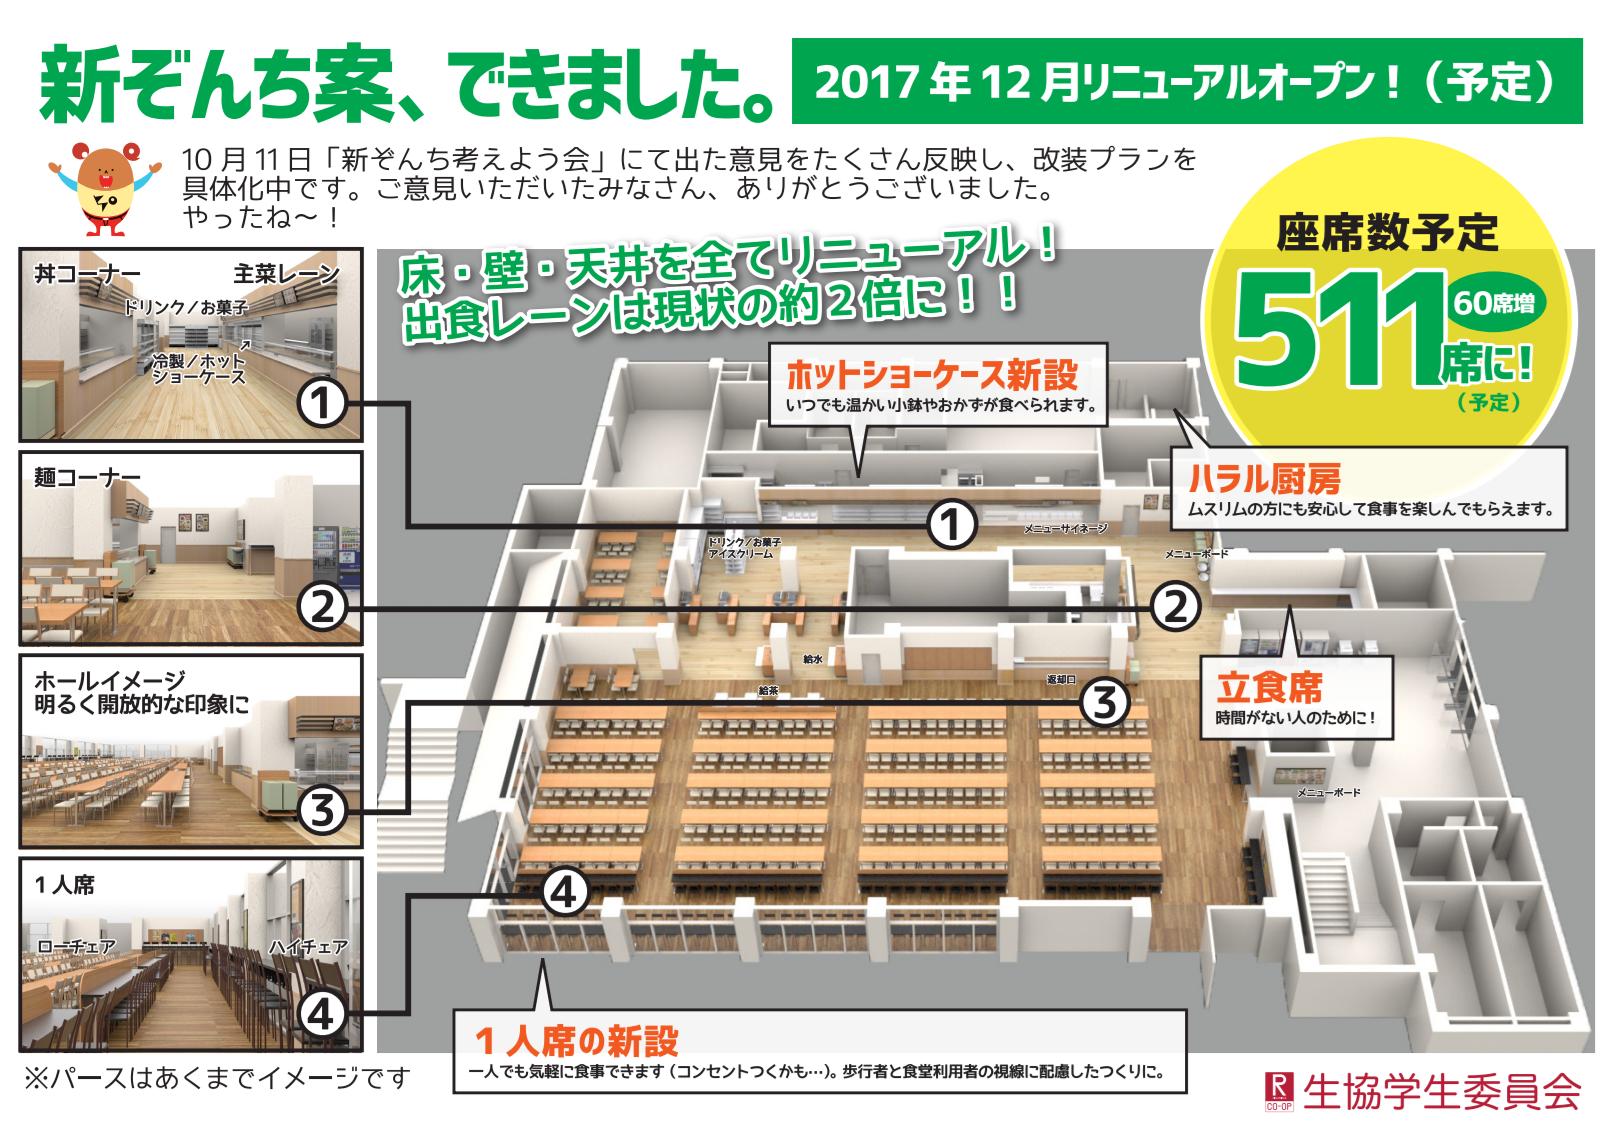 http://www.ritsco-op.jp/pickup/Screenmemo_2016-12-15-17-27-07.png